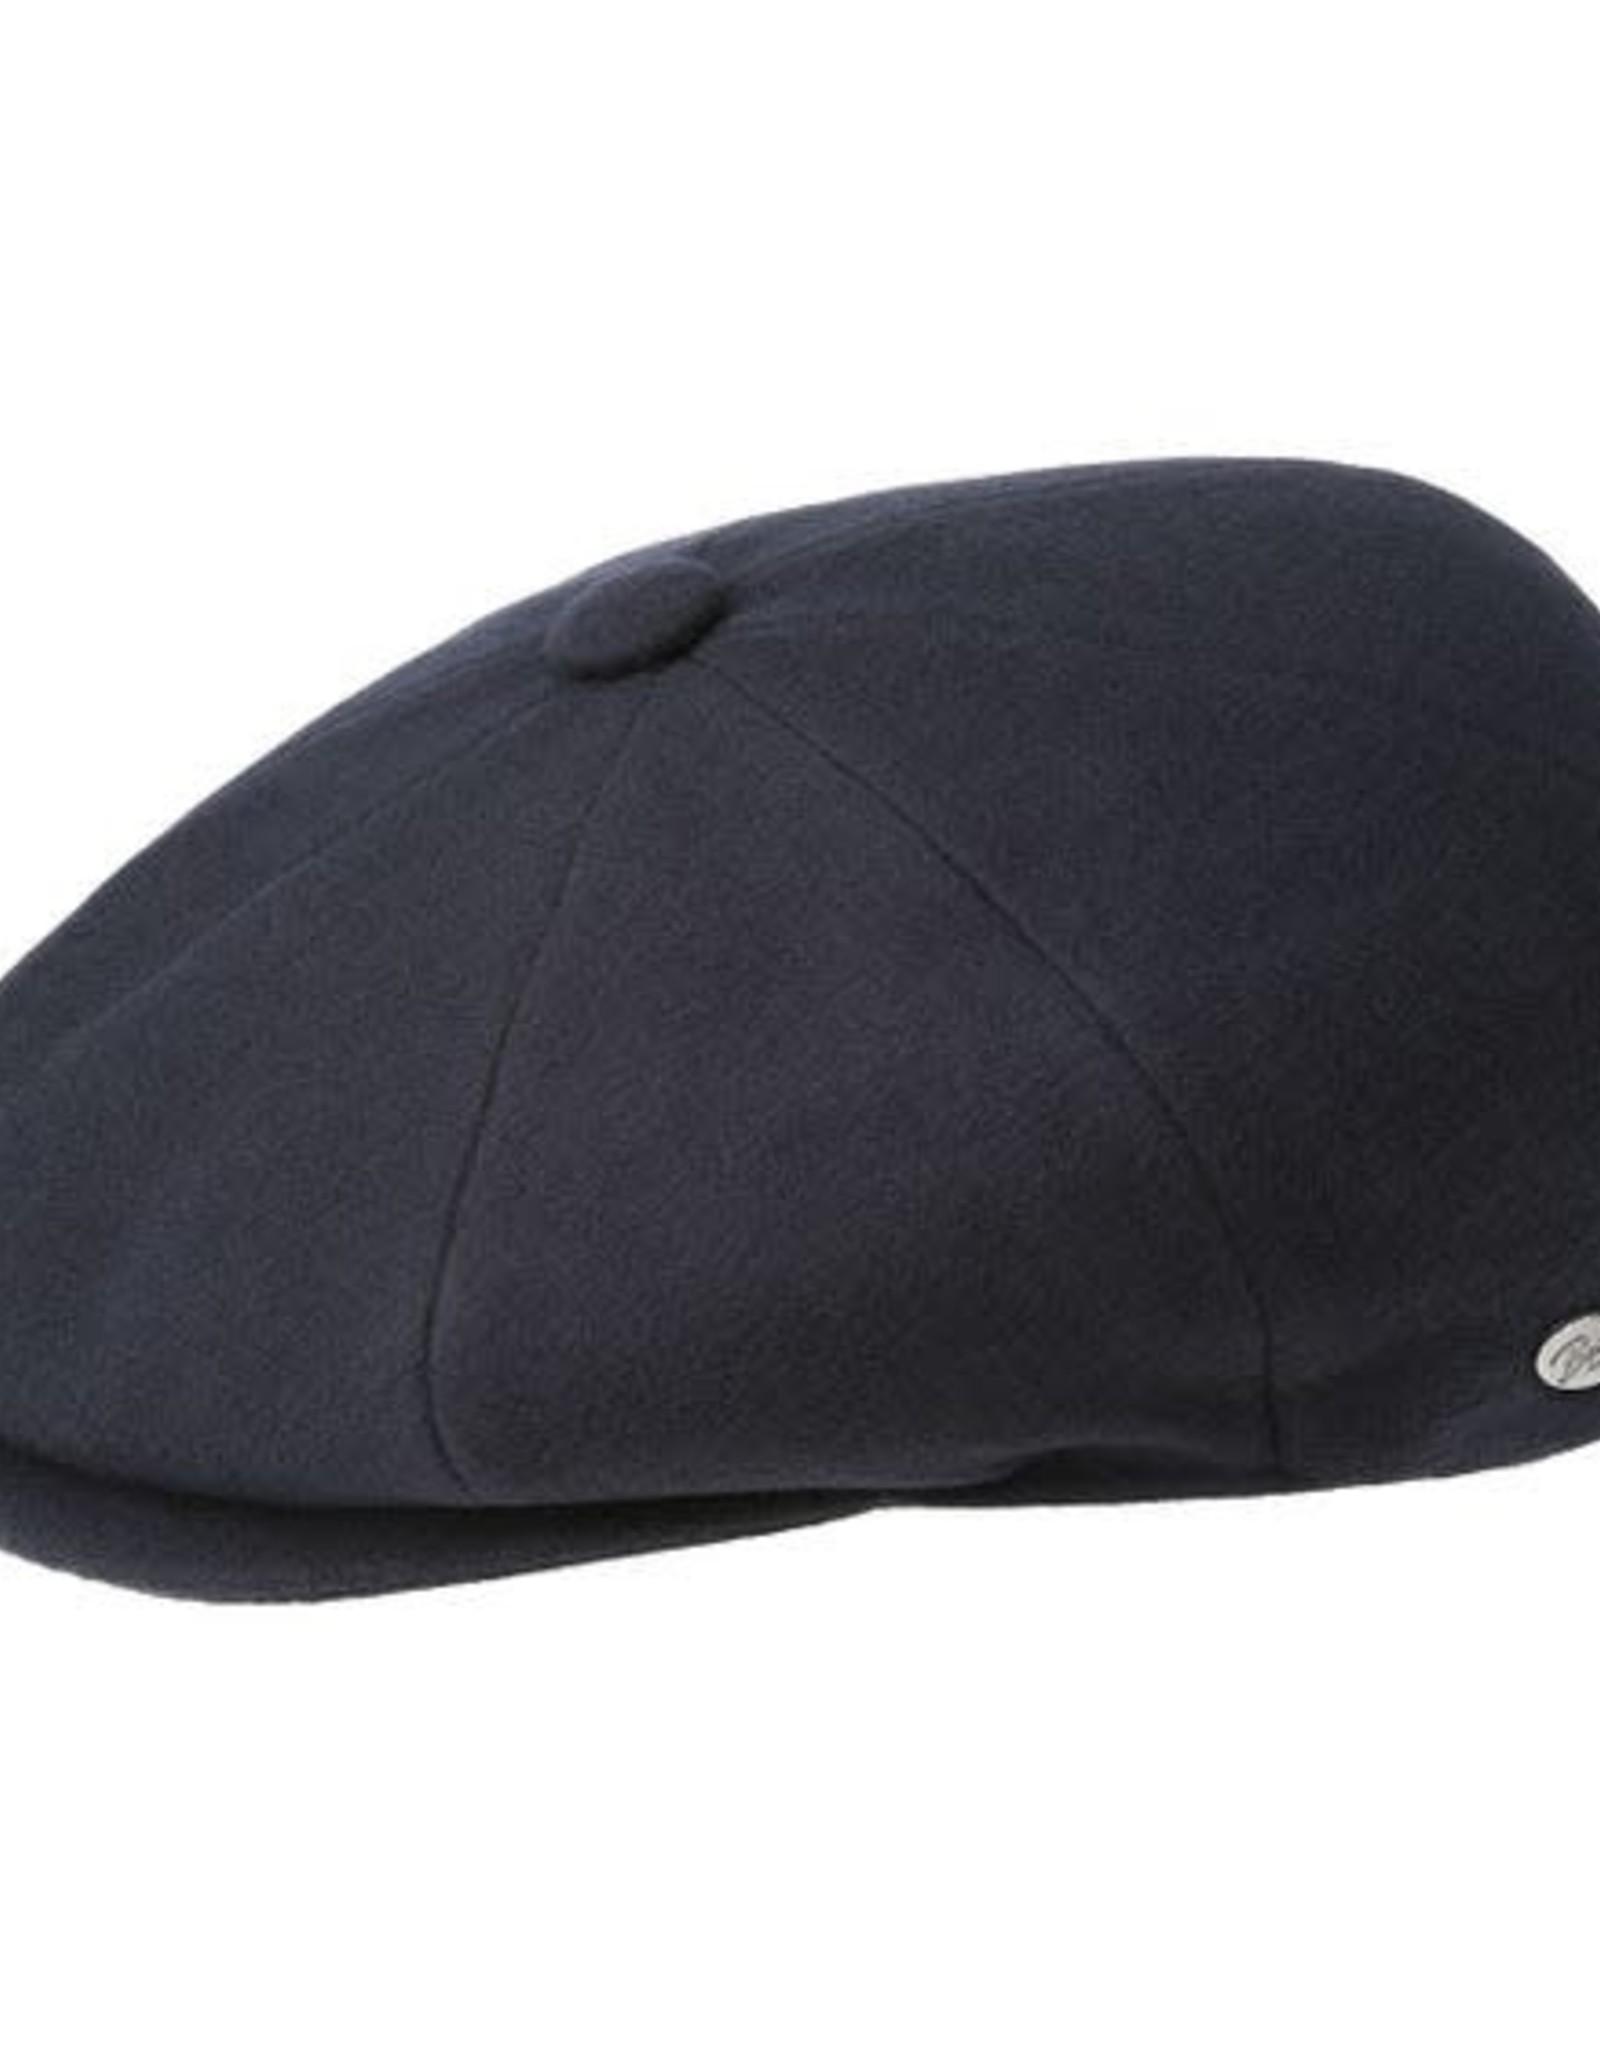 Bailey Hat Co. HAT-8 PANEL CAP-GALVIN